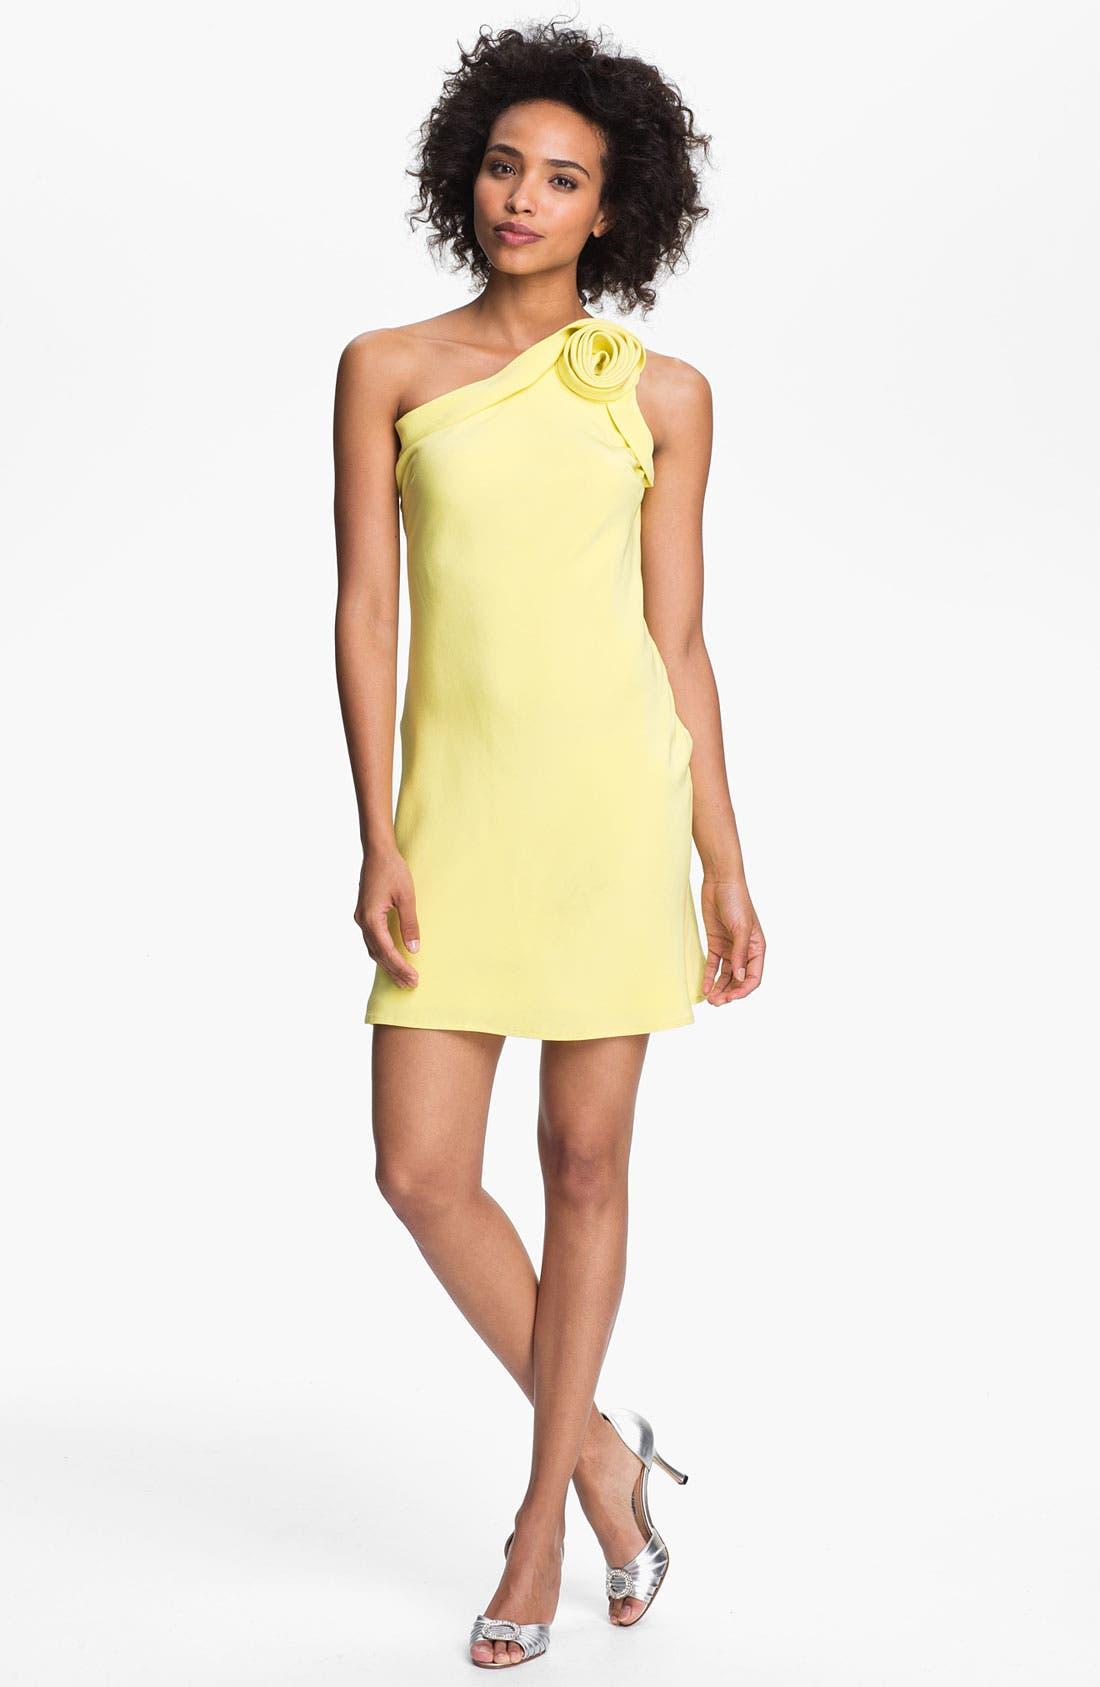 Main Image - A.B.S. by Allen Schwartz Rosette One Shoulder Dress